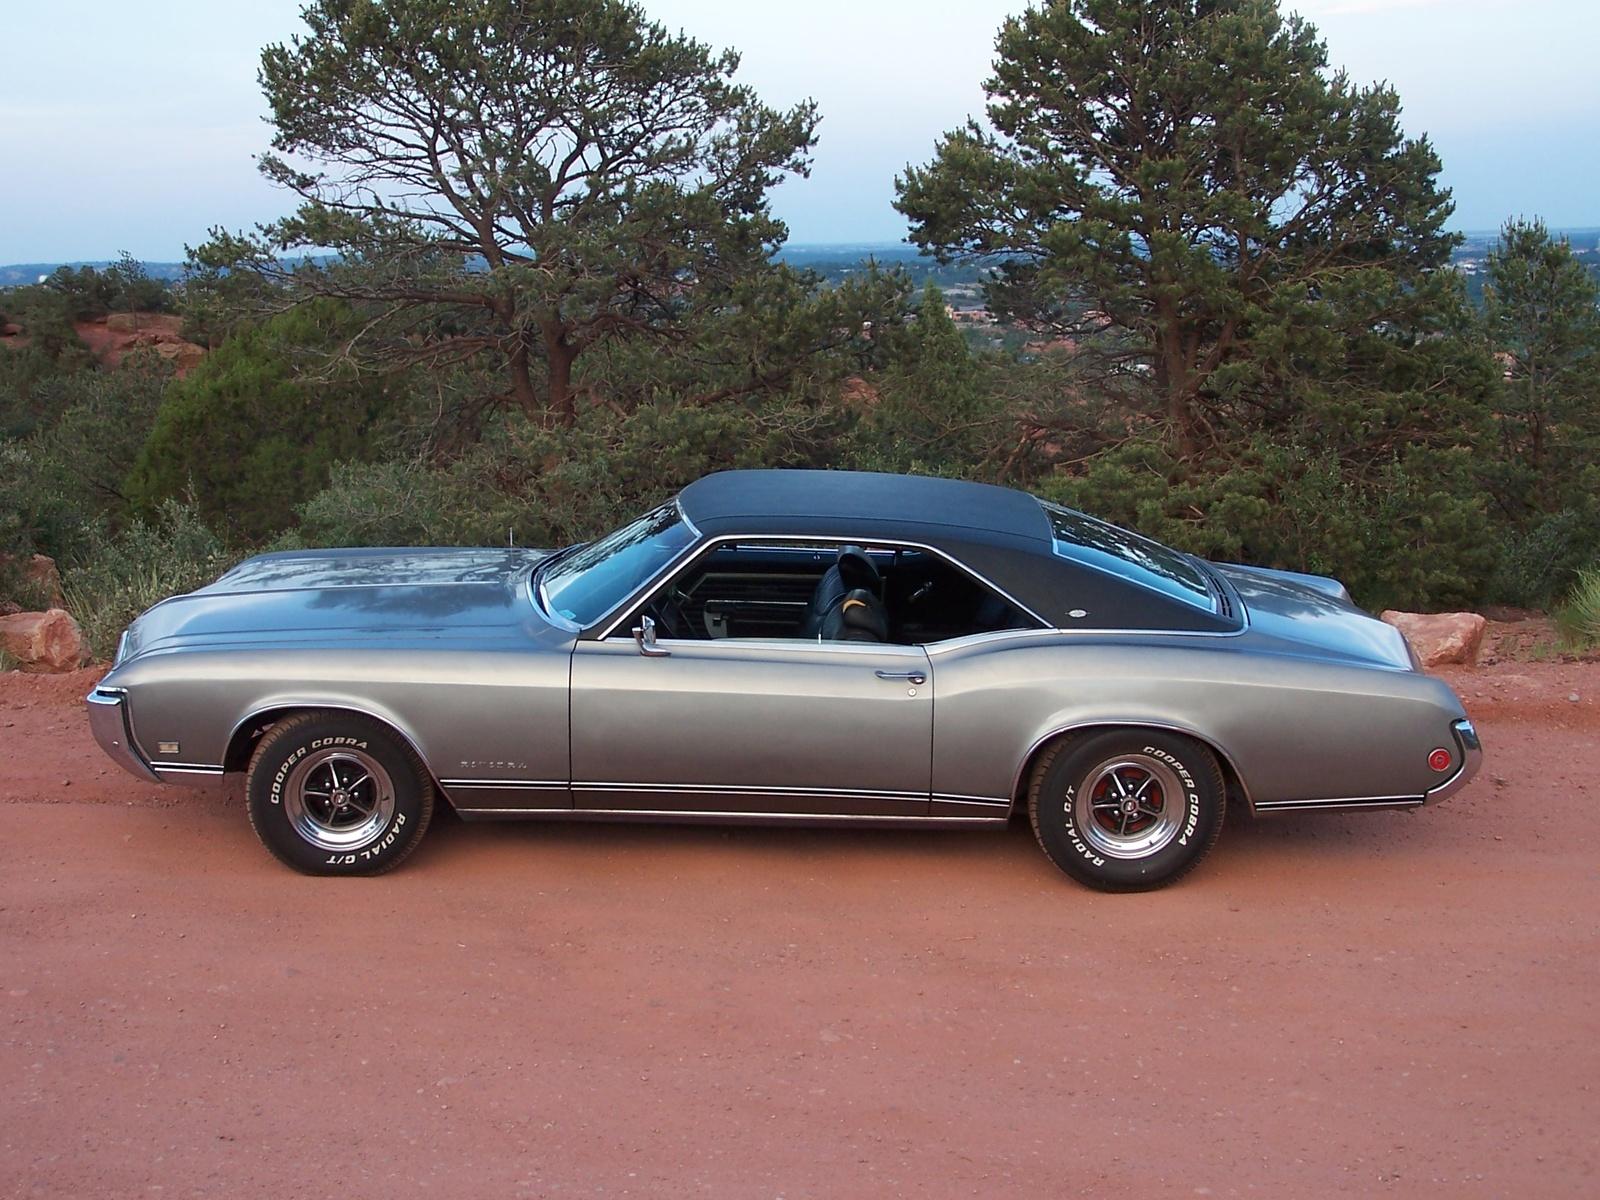 1969 Buick Riviera - Pictures - 1969 Buick Riviera picture - CarGurus